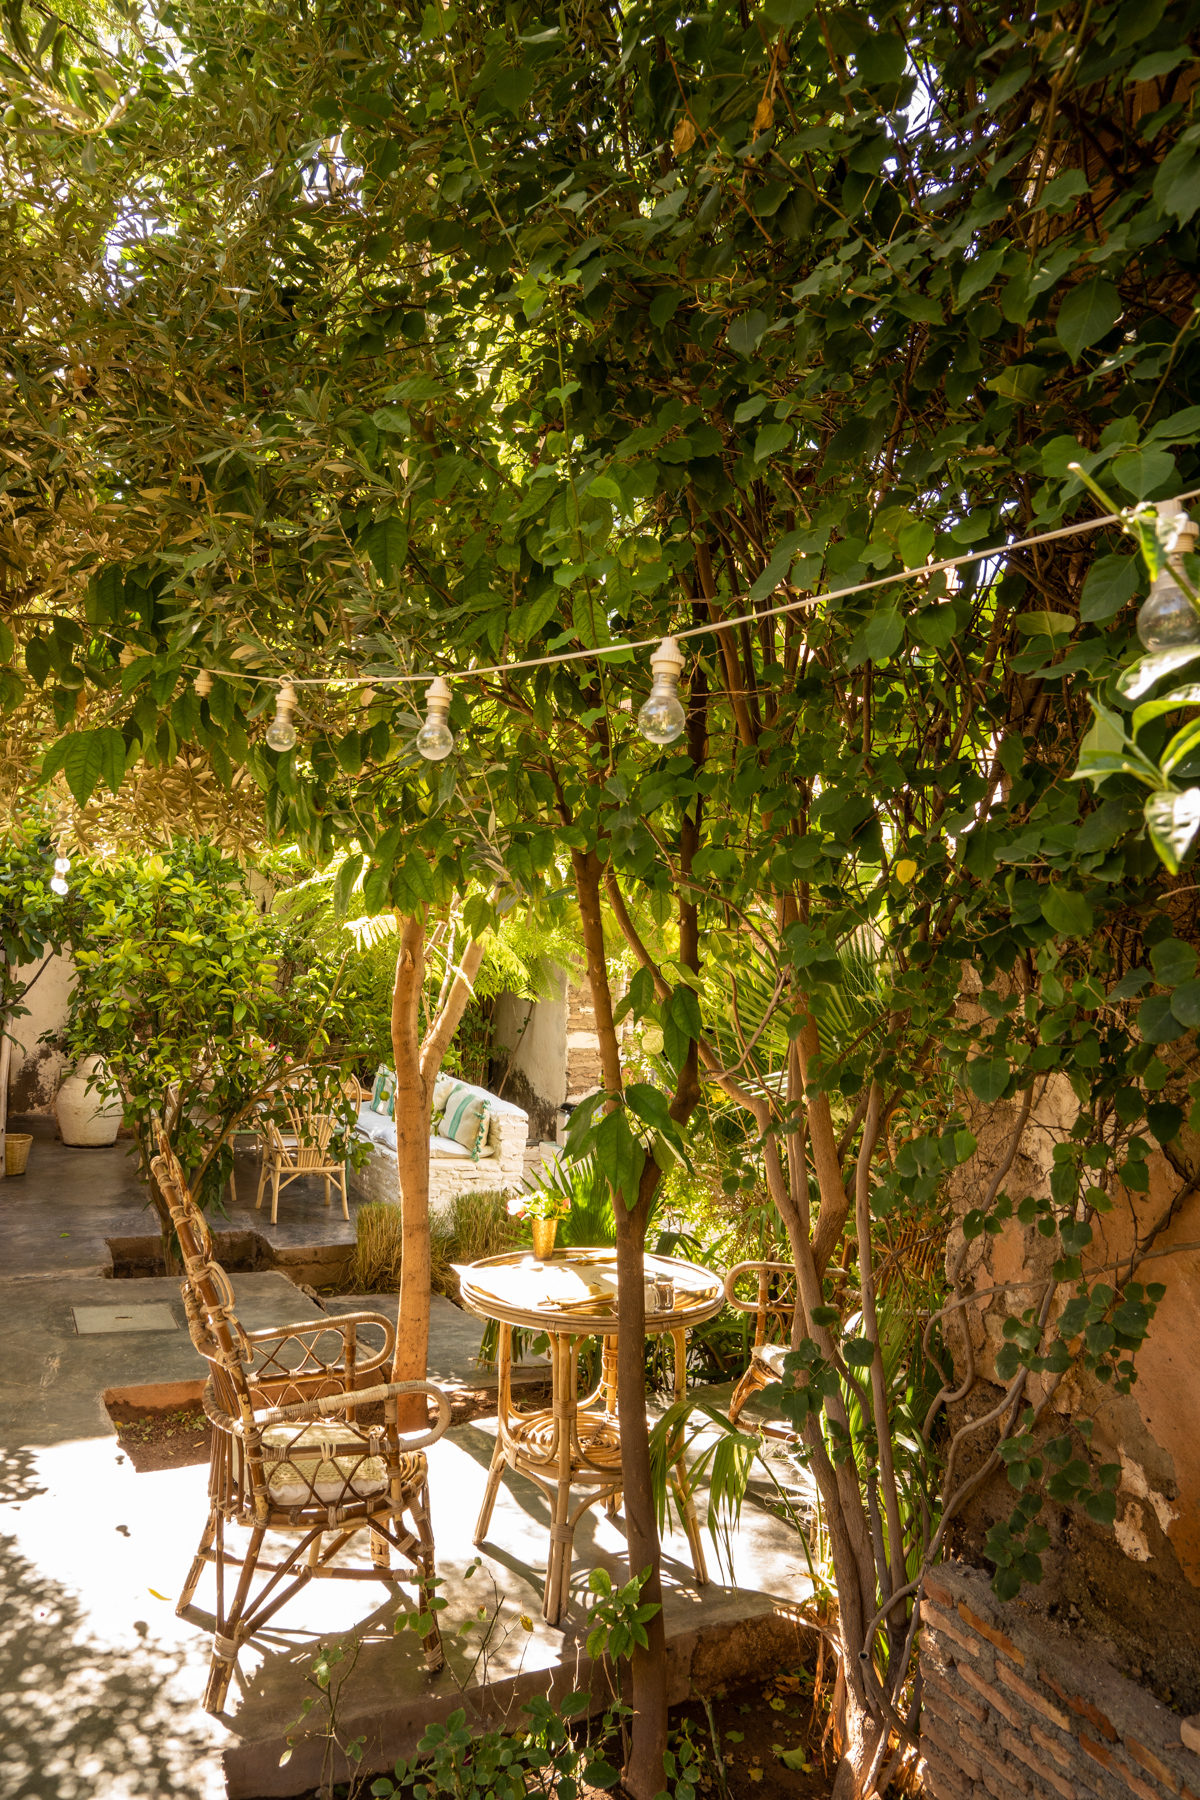 marrakech, médina marrakech, médina, souks marrakech, marrakech city guide, marrakech séjour, marrakech week-end, marrakech voyage, restaurant la famille, restaurant marrakech, la famille marrakech